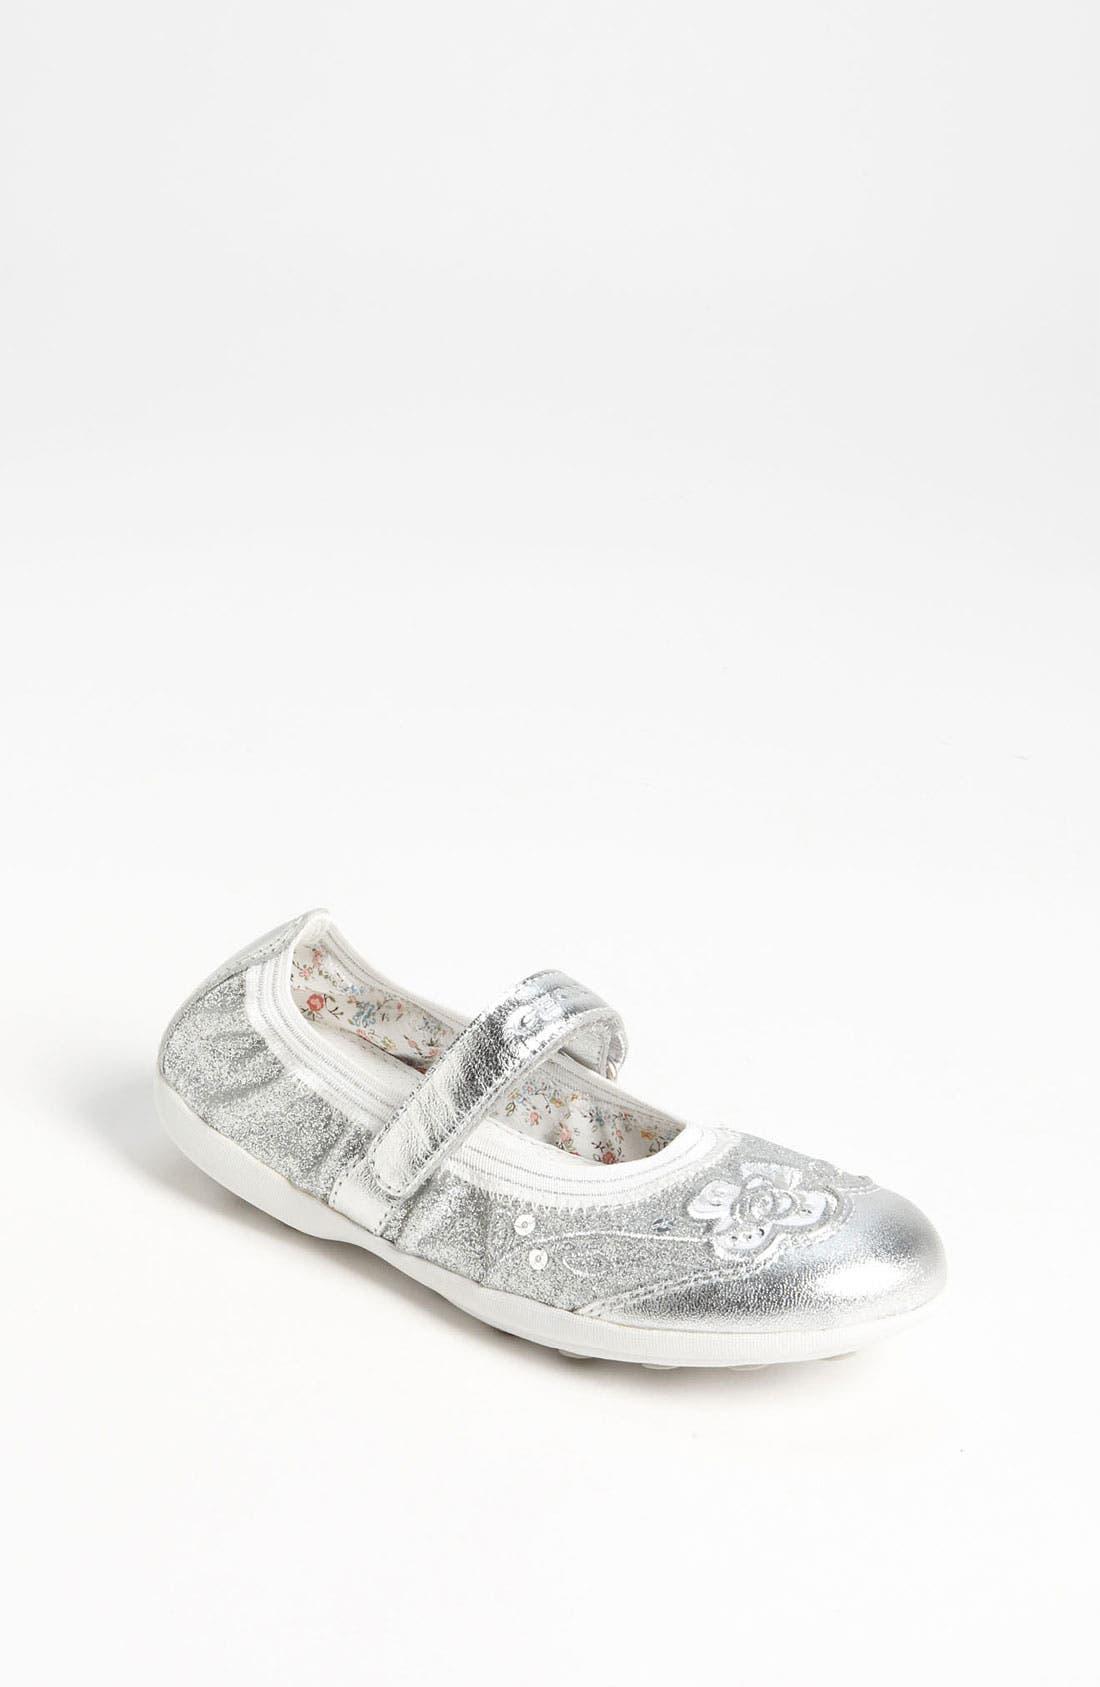 Main Image - Geox Junior 'Jodie' Mary Jane Sneaker (Toddler & Little Kid)